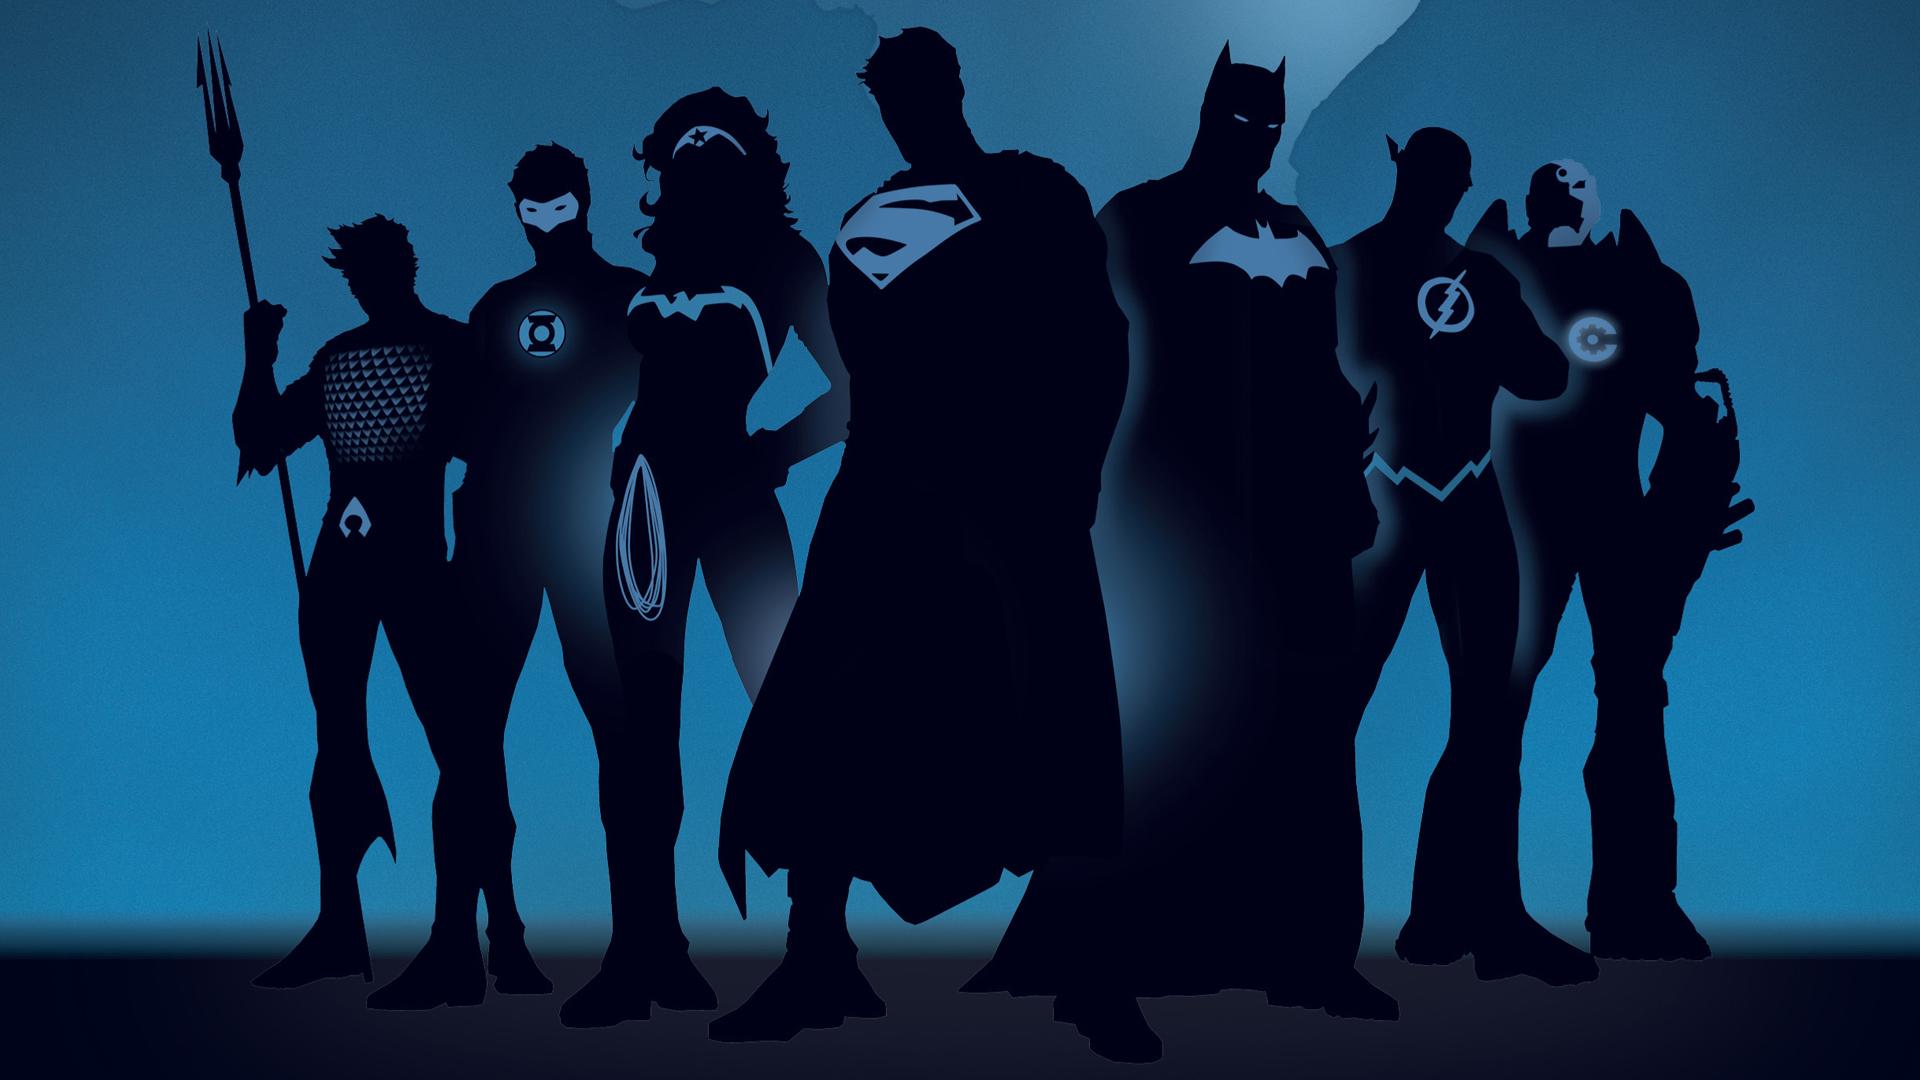 Comics - Justice League - Aquaman - Green Lantern - Wonder Woman ...